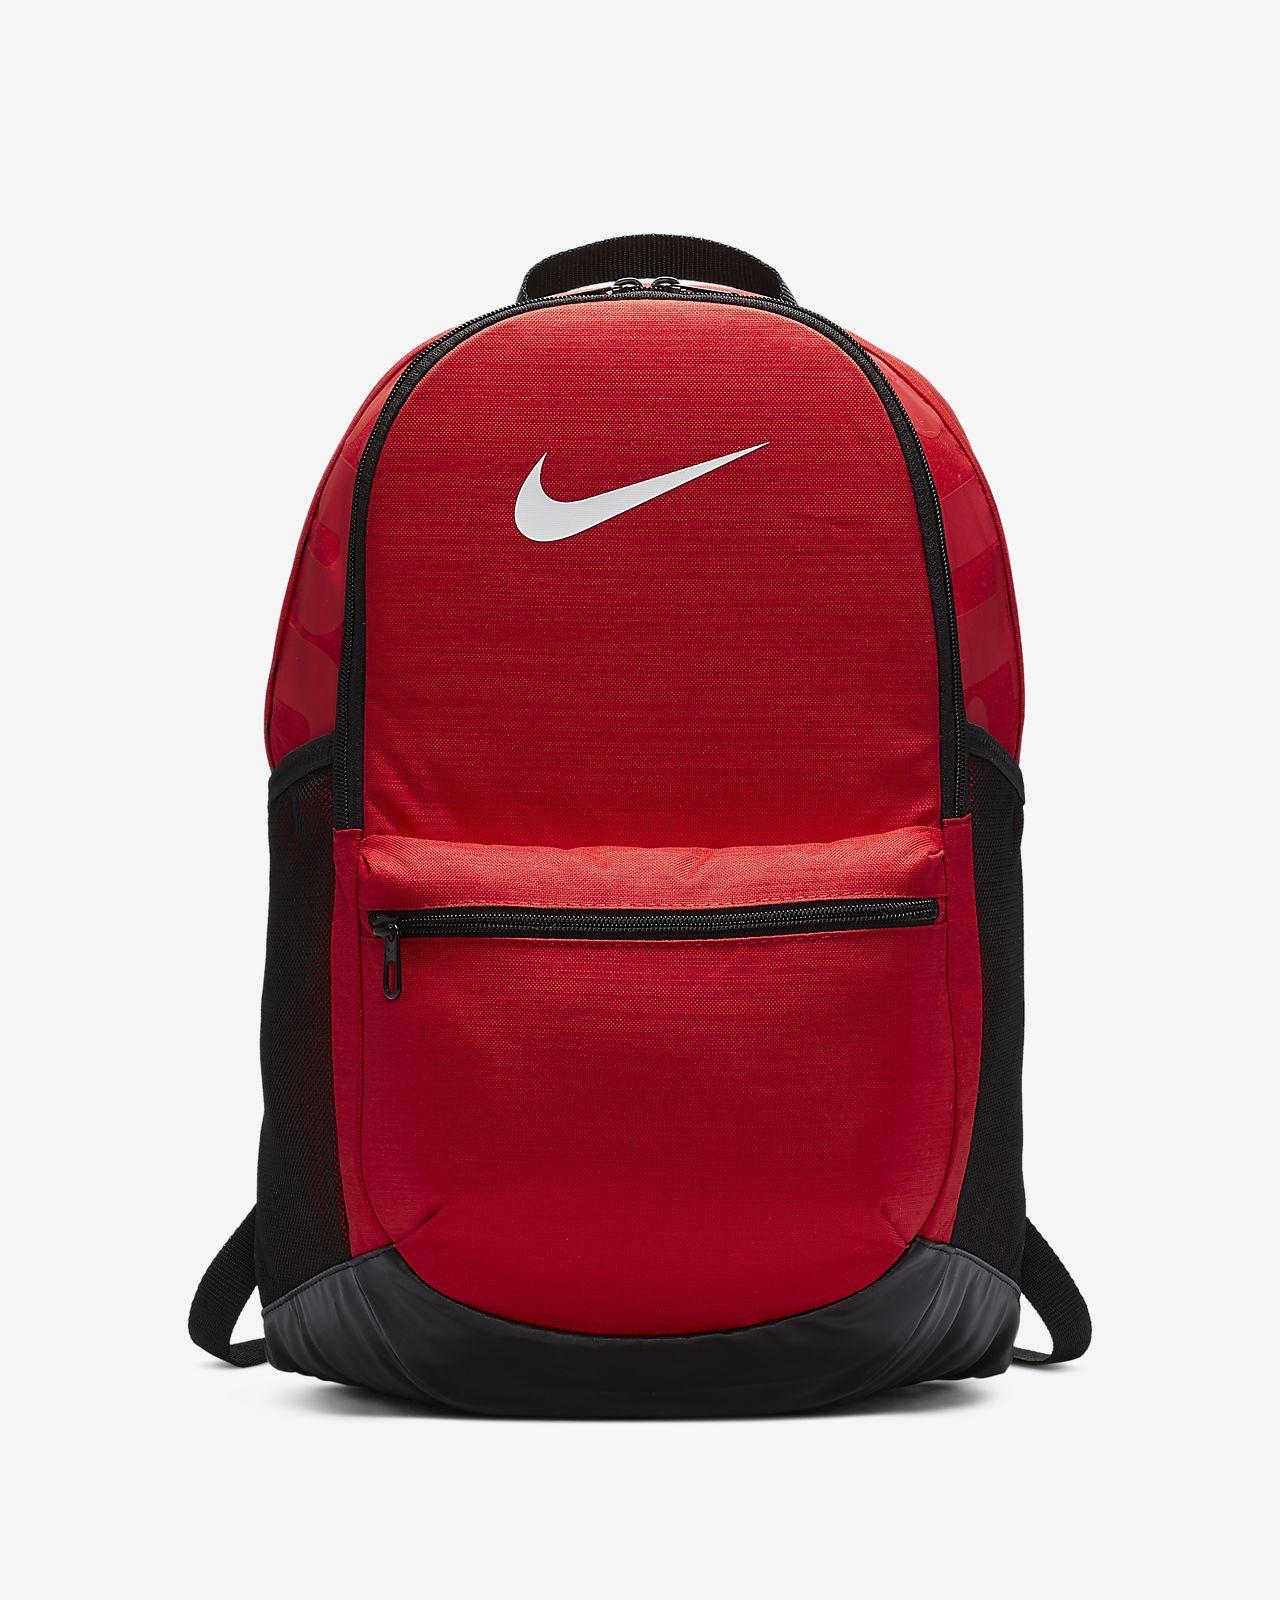 06a4f0bb9aa Nike Brasilia (Medium) Training Backpack. Nike.com